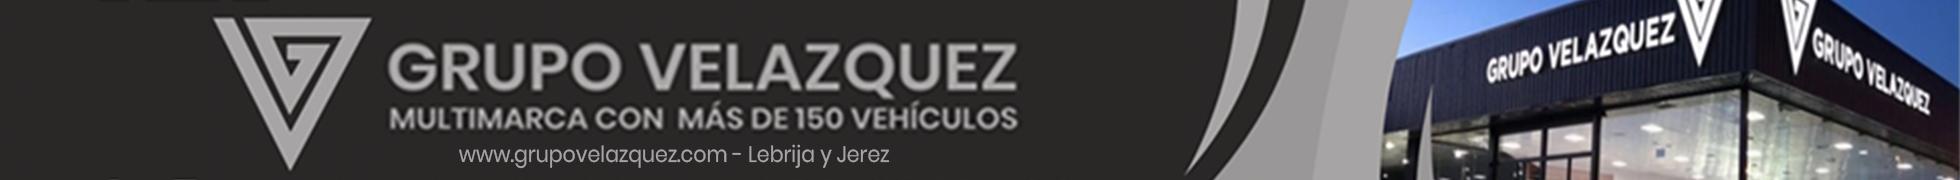 Grupo Velázquez